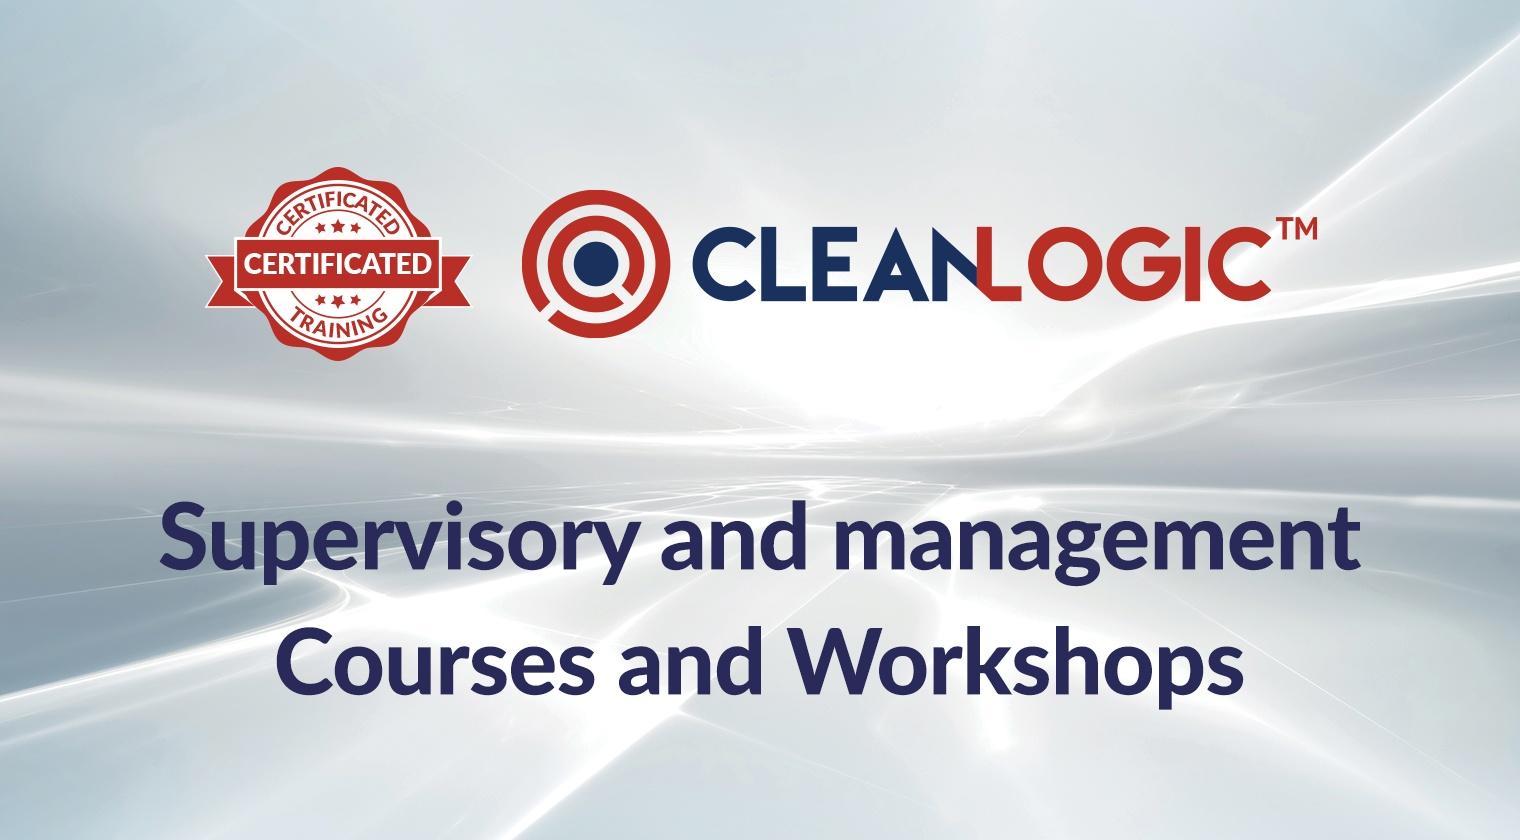 Cleanlogic™